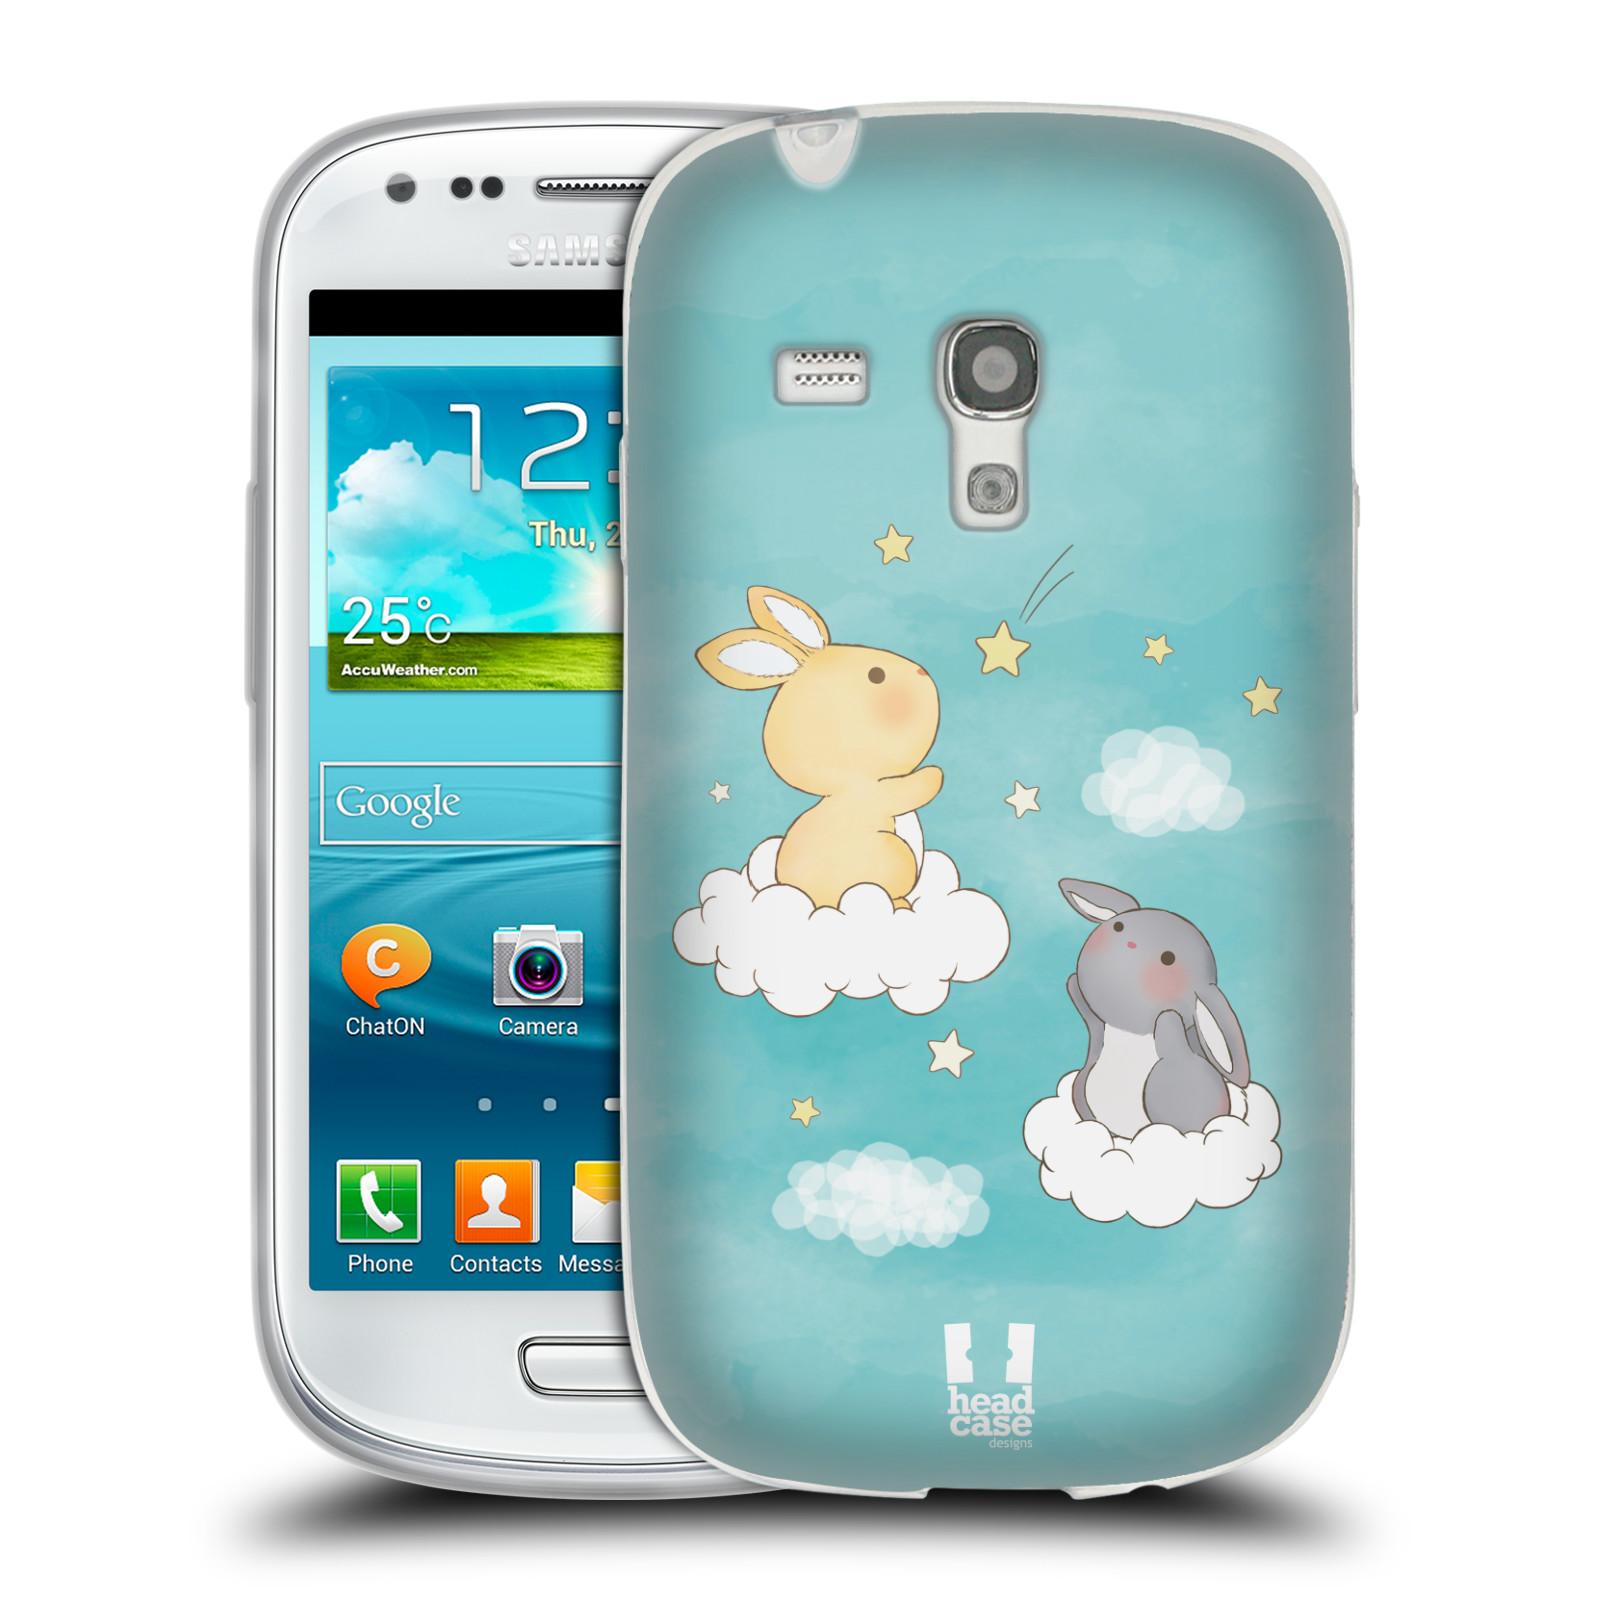 HEAD CASE silikonový obal na mobil Samsung Galaxy S3 MINI i8190 vzor králíček a hvězdy modrá